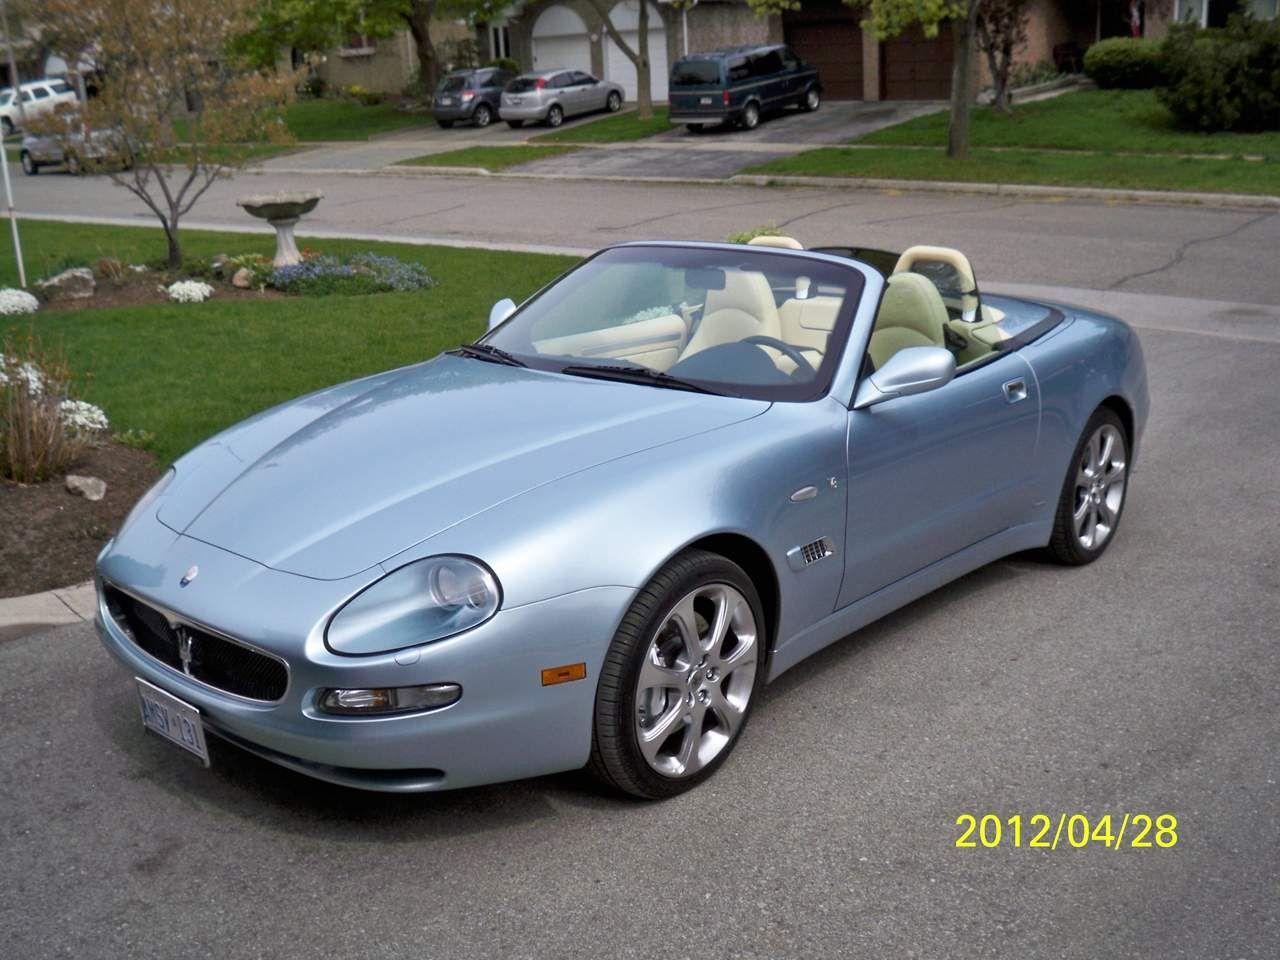 Maserati Spyder CC (200-2005)